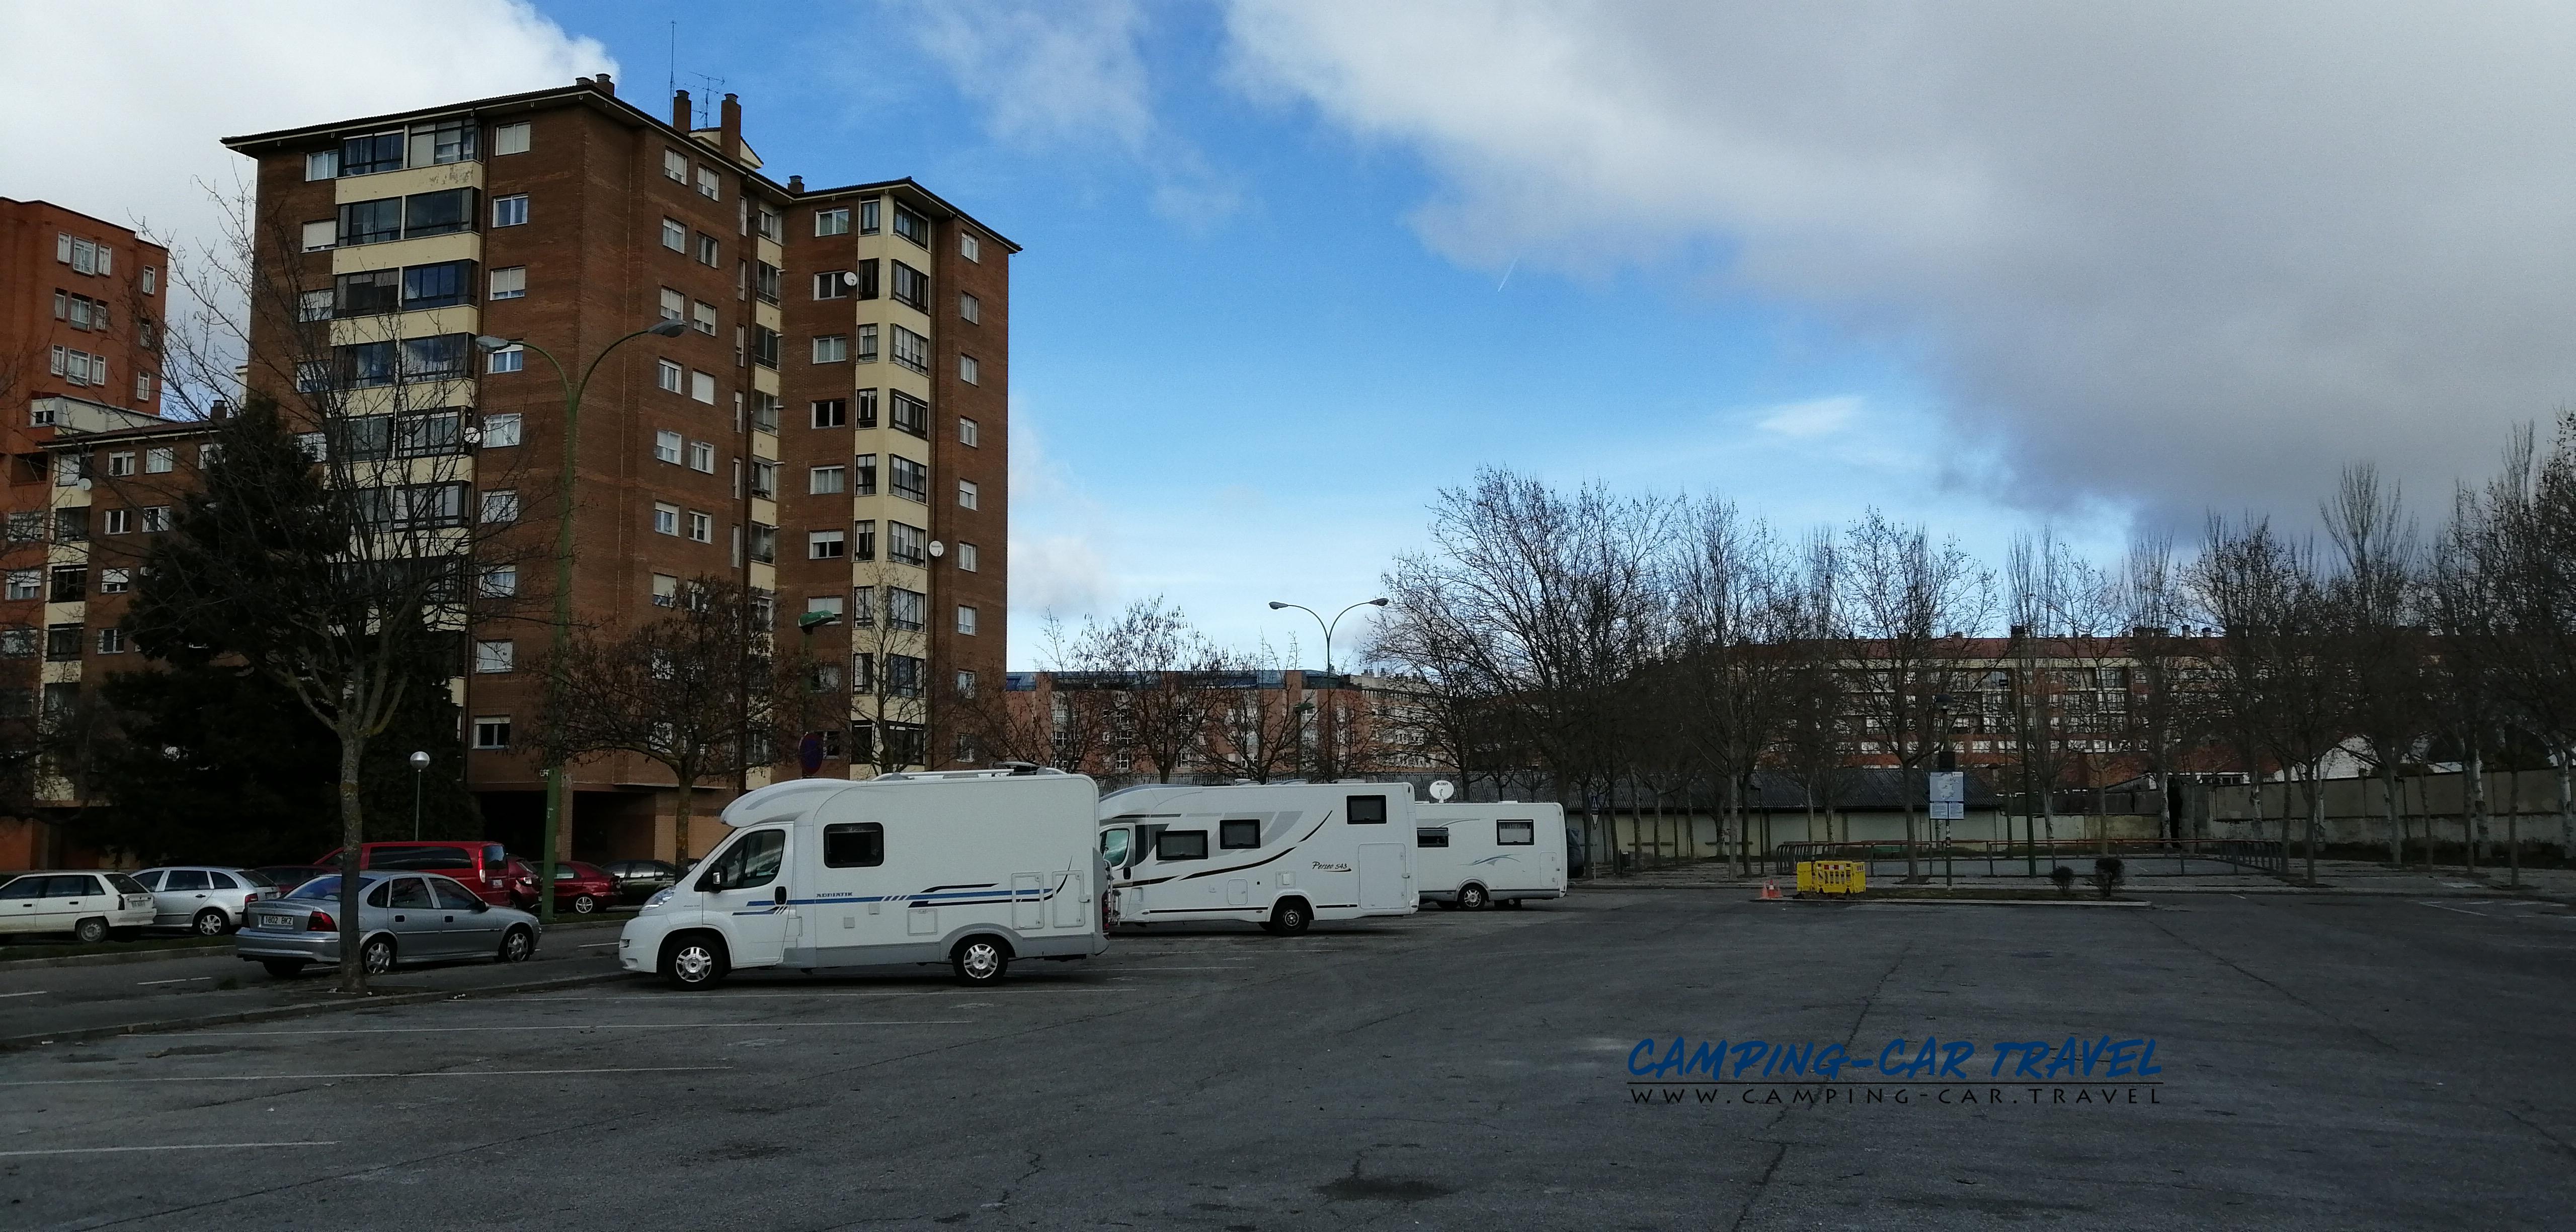 aire services camping car Burgos Espagne Spain